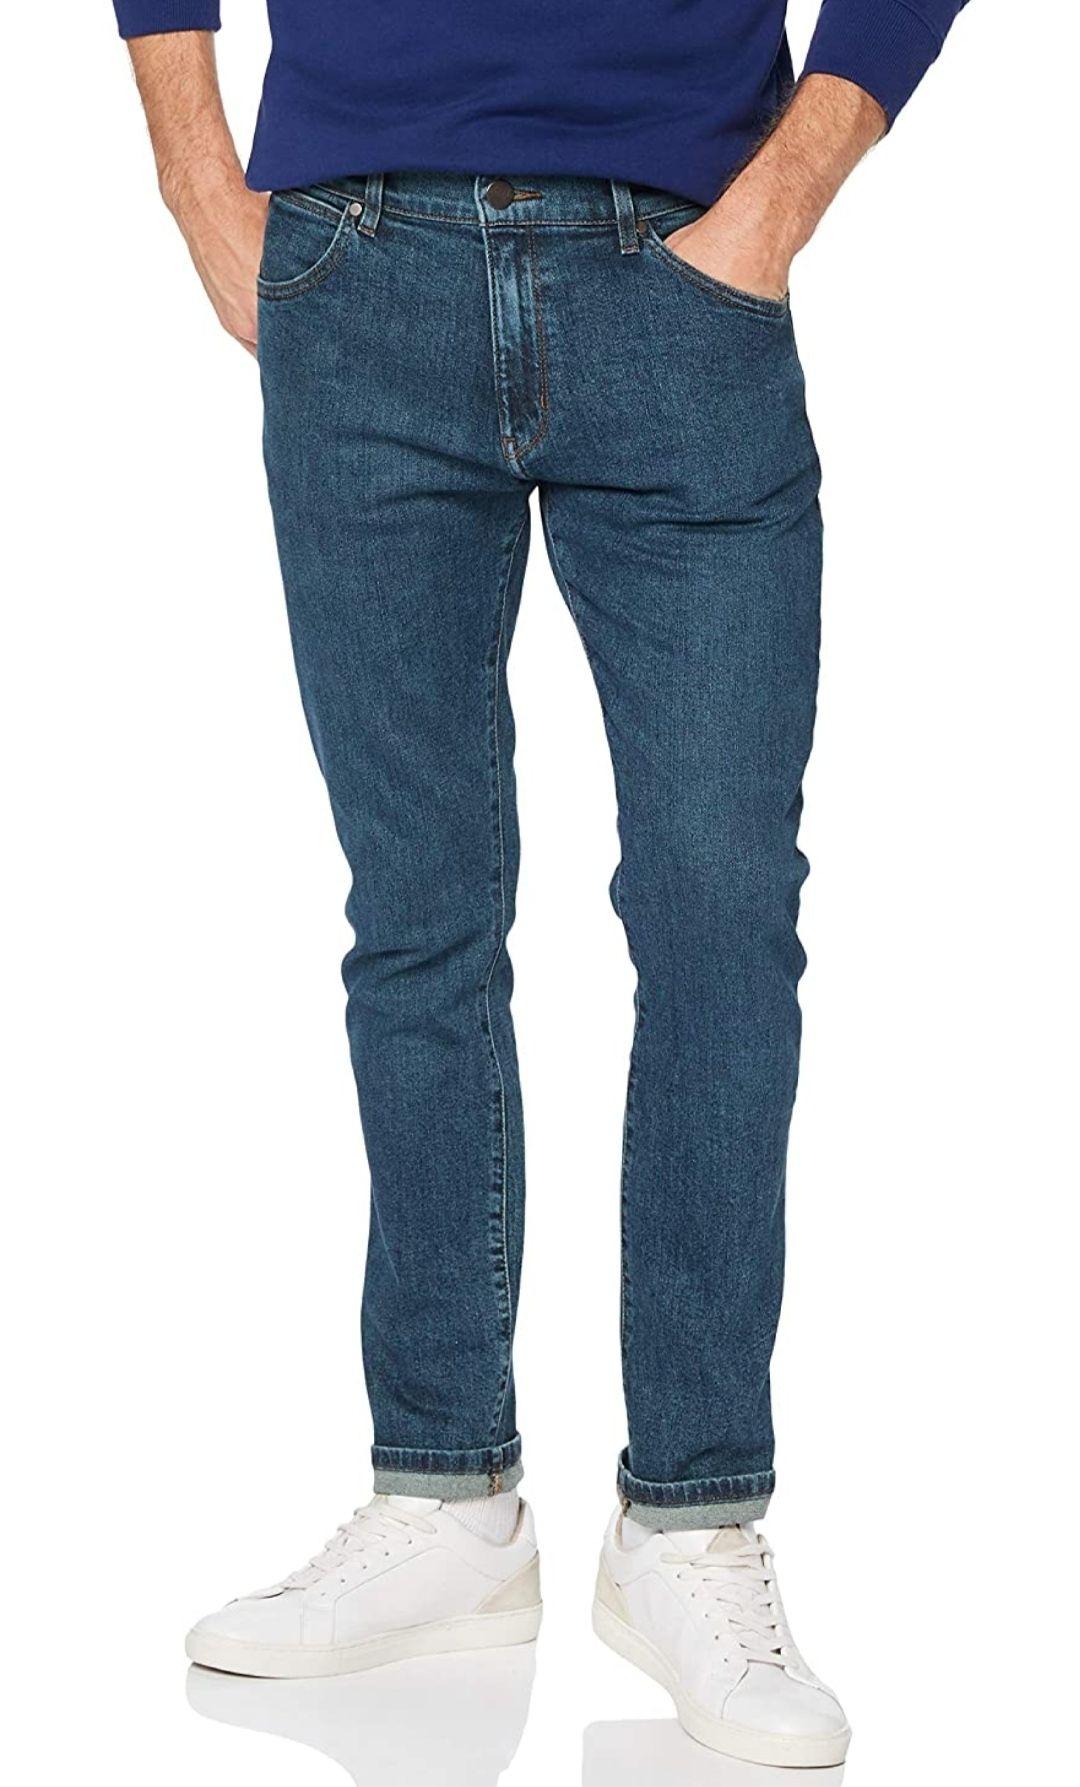 Pantalones Wrangler 32/32 por menos de 16€!